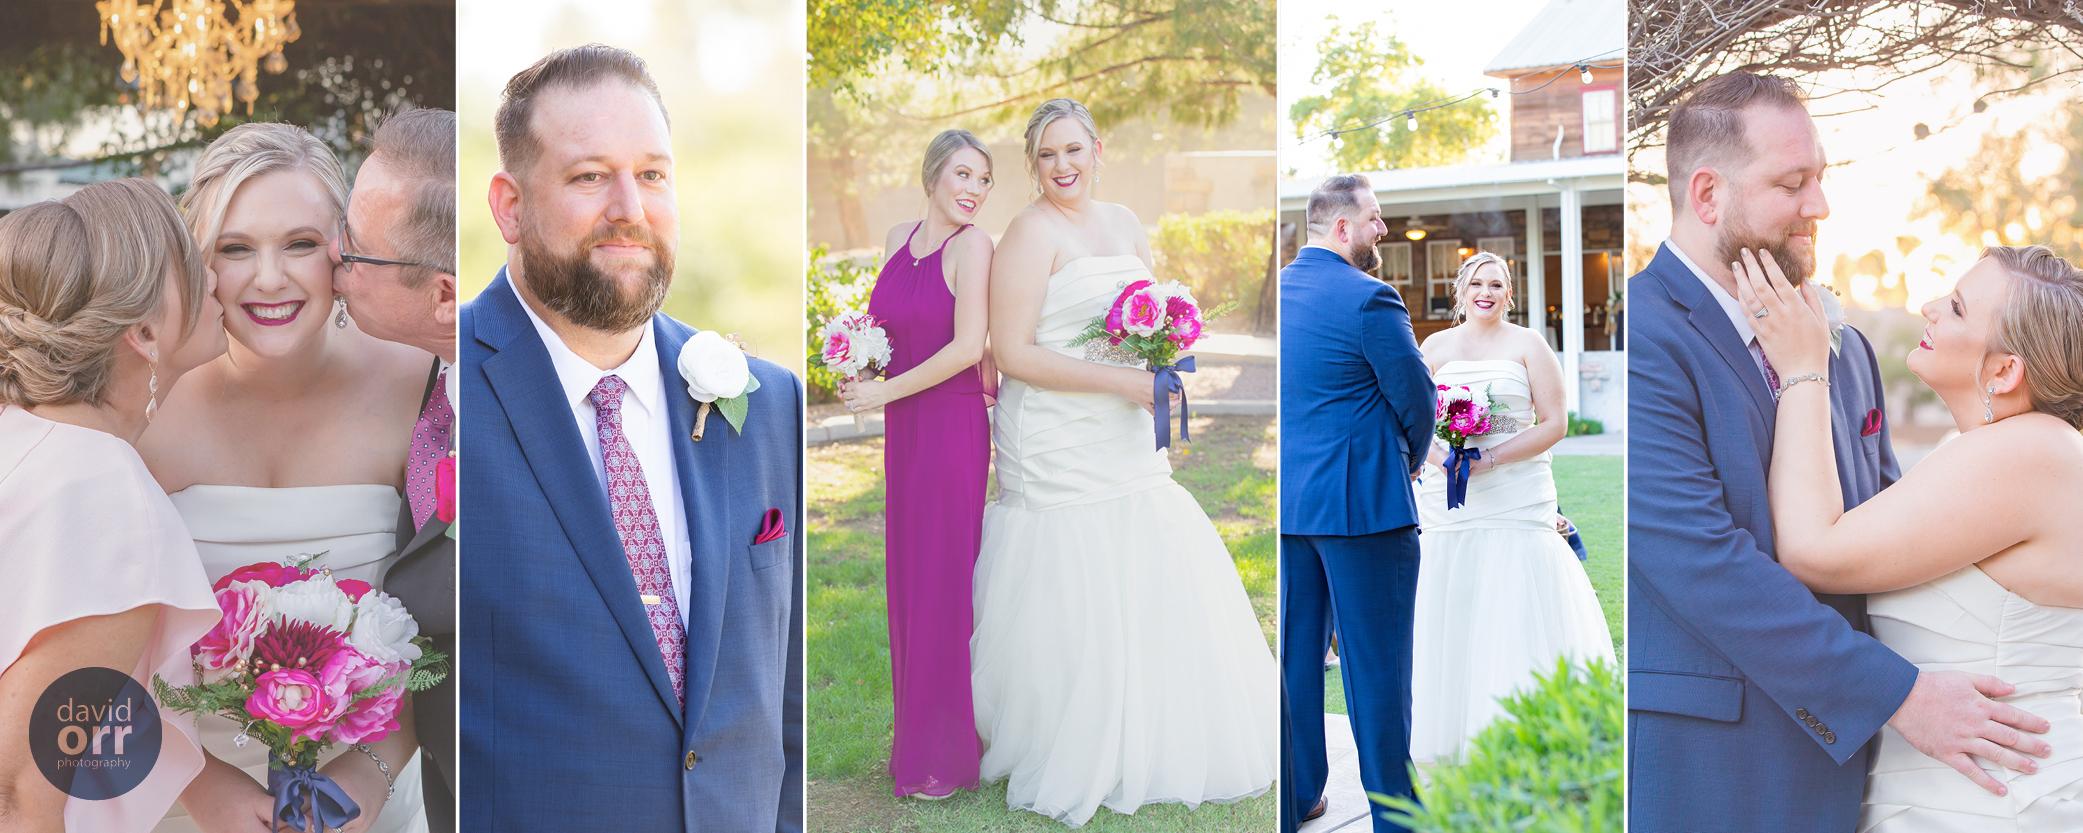 David-Orr-Photography_Shenandoah-Mill-Wedding1-Gilbert.jpg